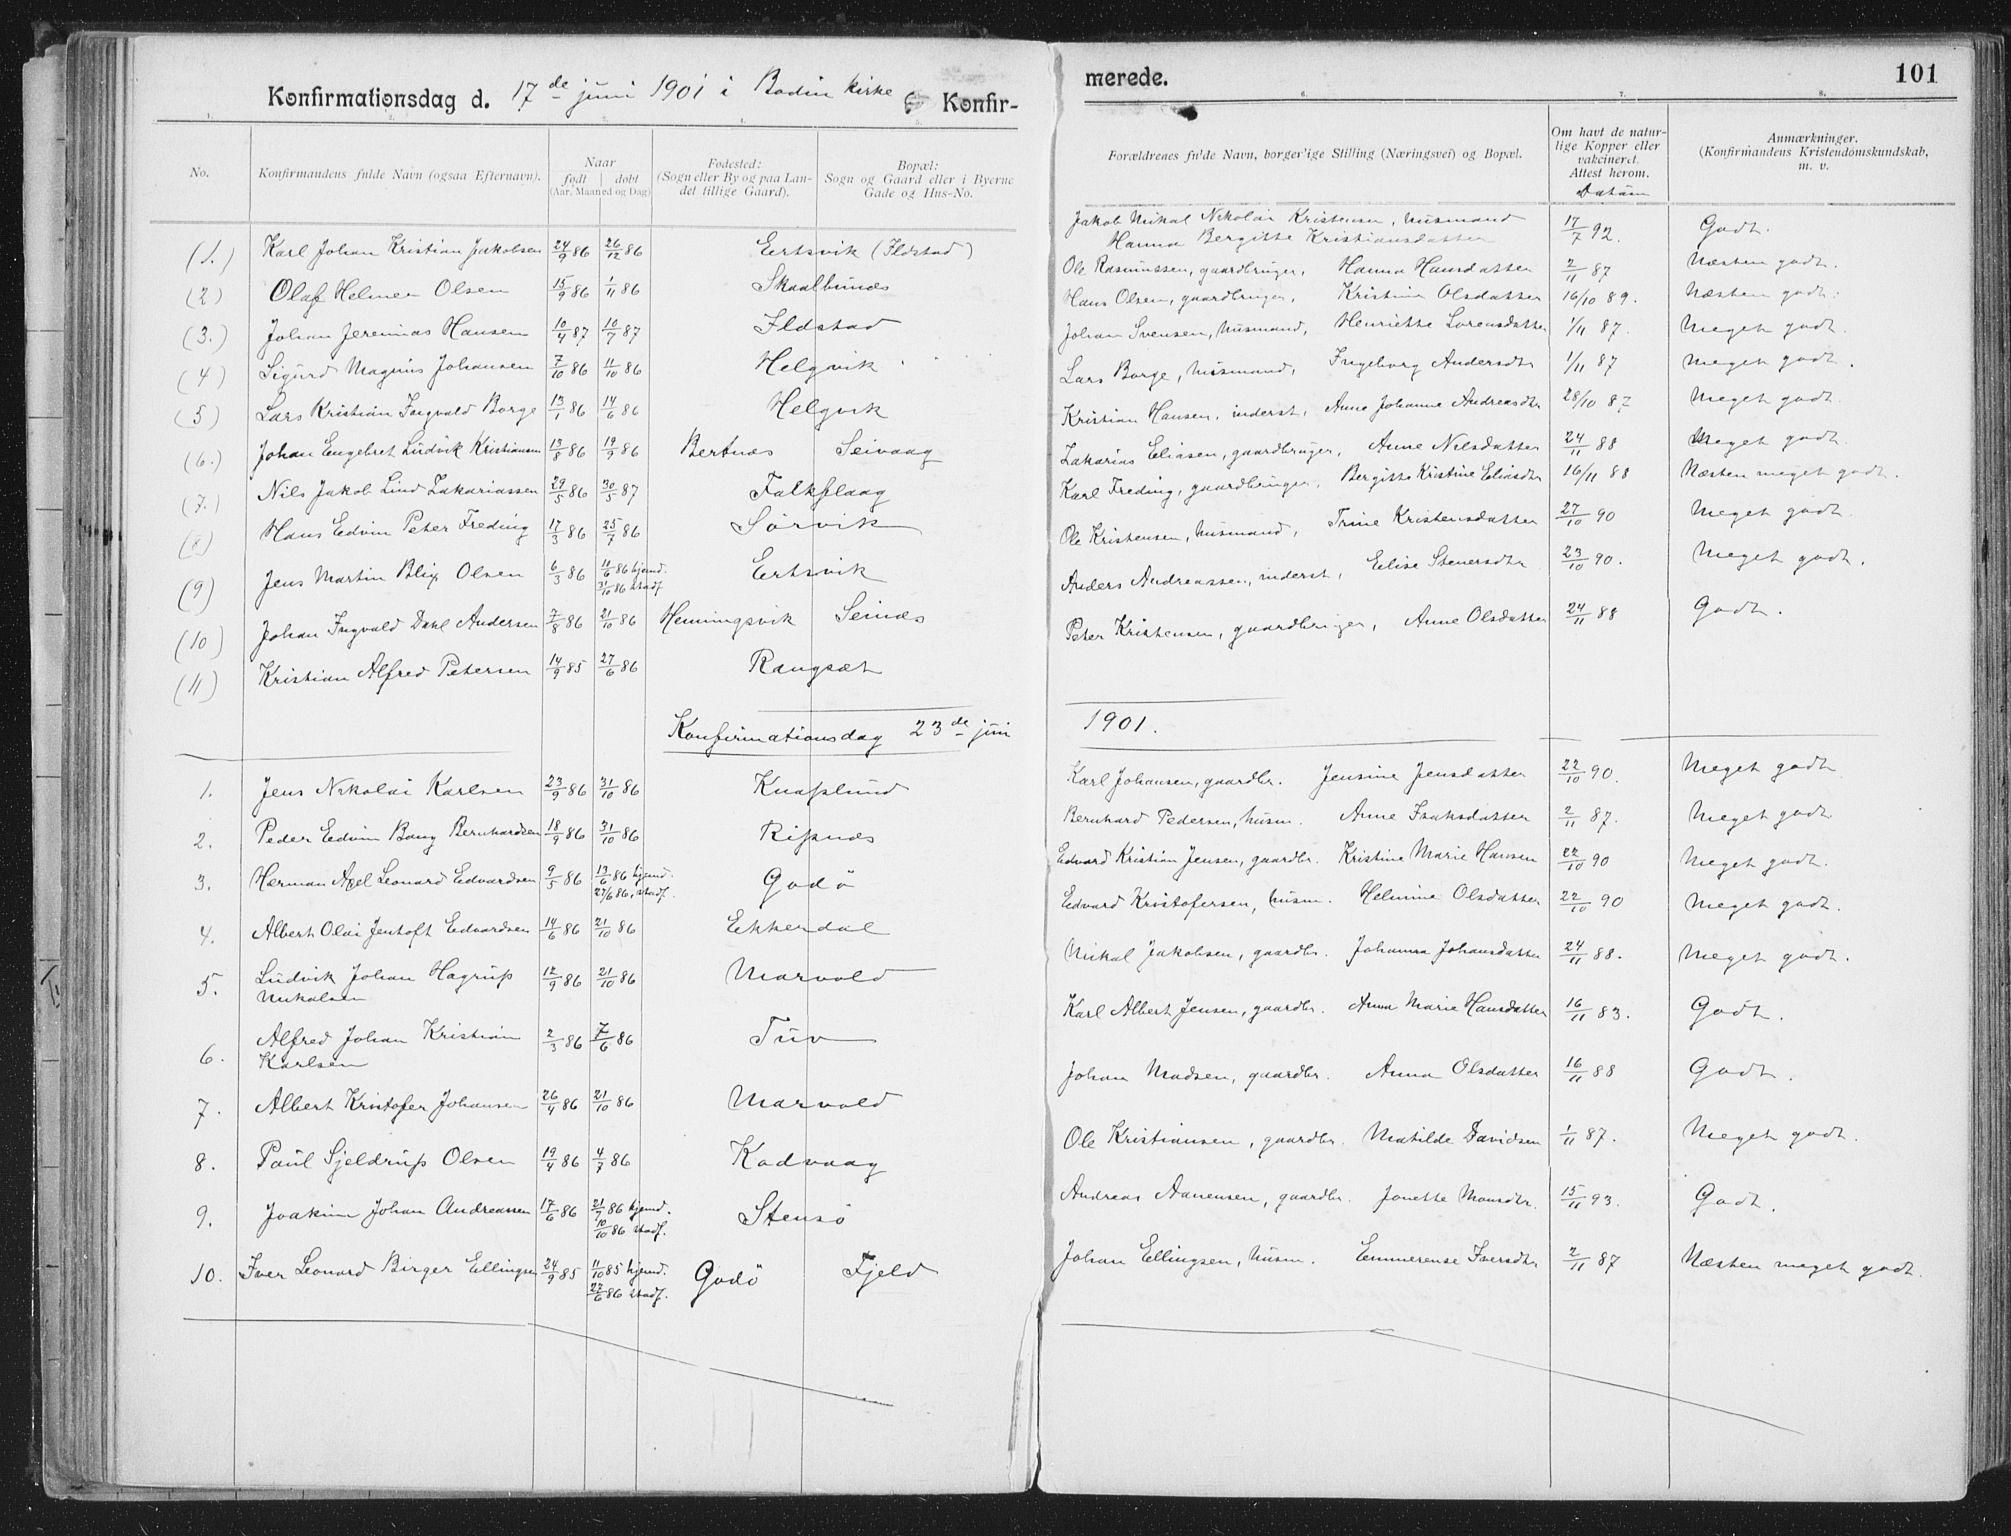 SAT, Ministerialprotokoller, klokkerbøker og fødselsregistre - Nordland, 804/L0081: Ministerialbok nr. 804A02, 1901-1915, s. 101